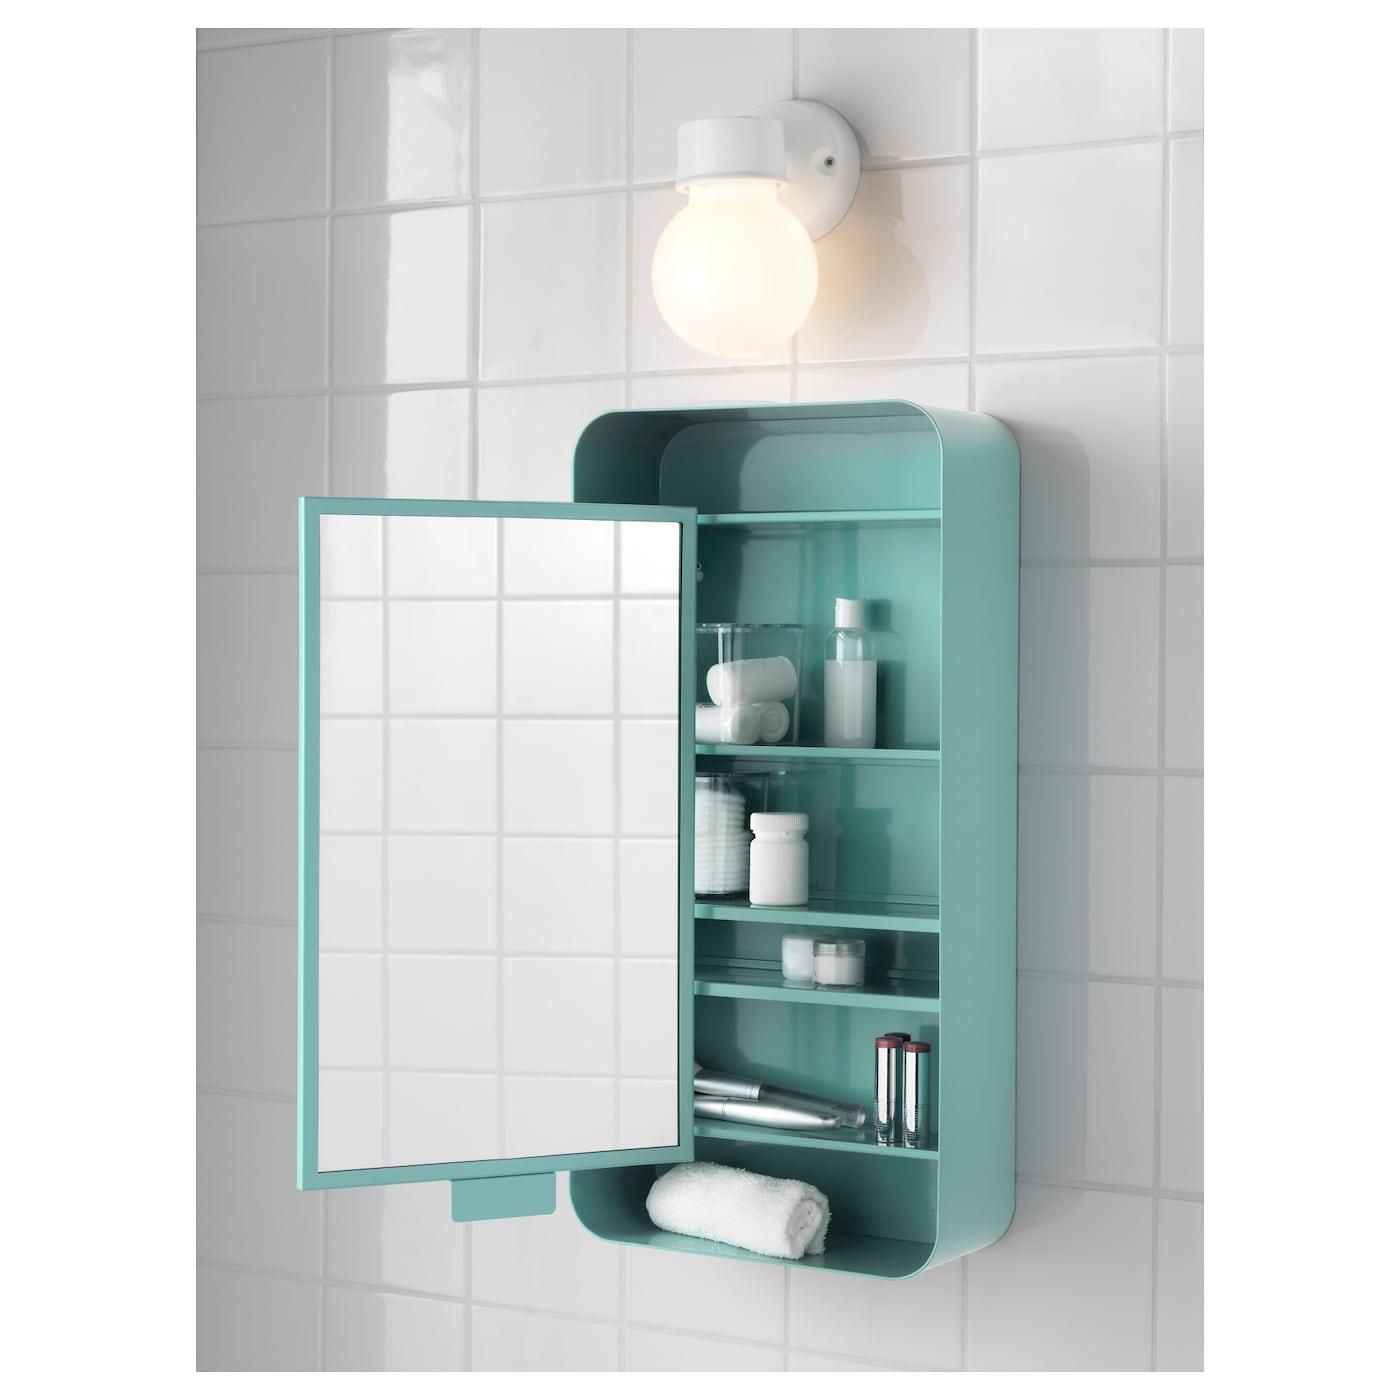 Gunnern Mirror Cabinet With 1 Door Turquoise 31x62 Cm Ikea